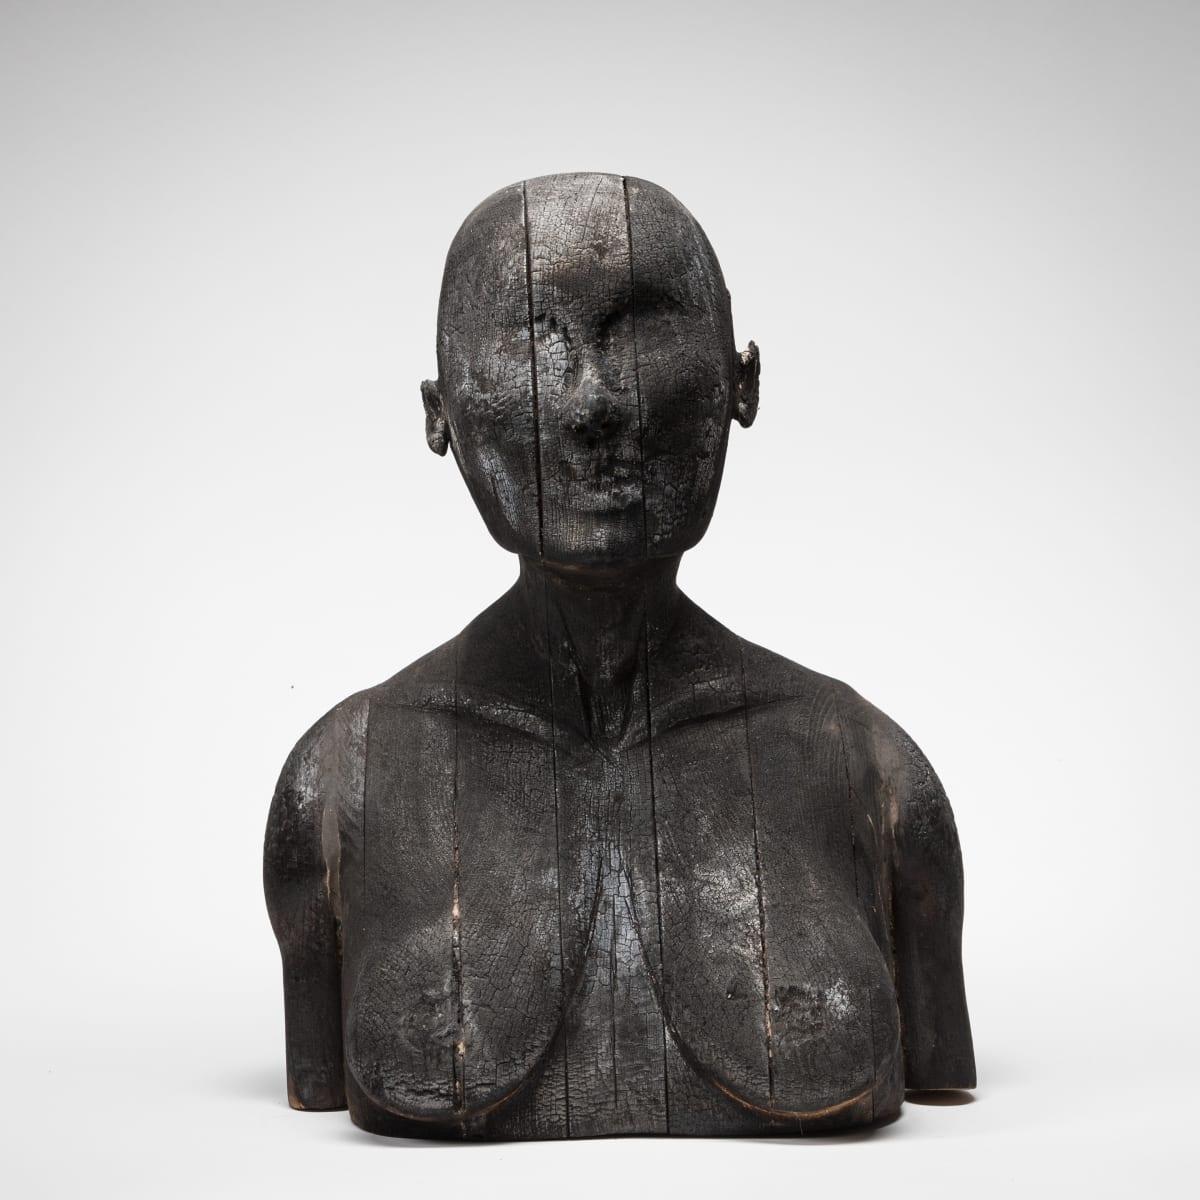 Thais Mather at 516 Arts